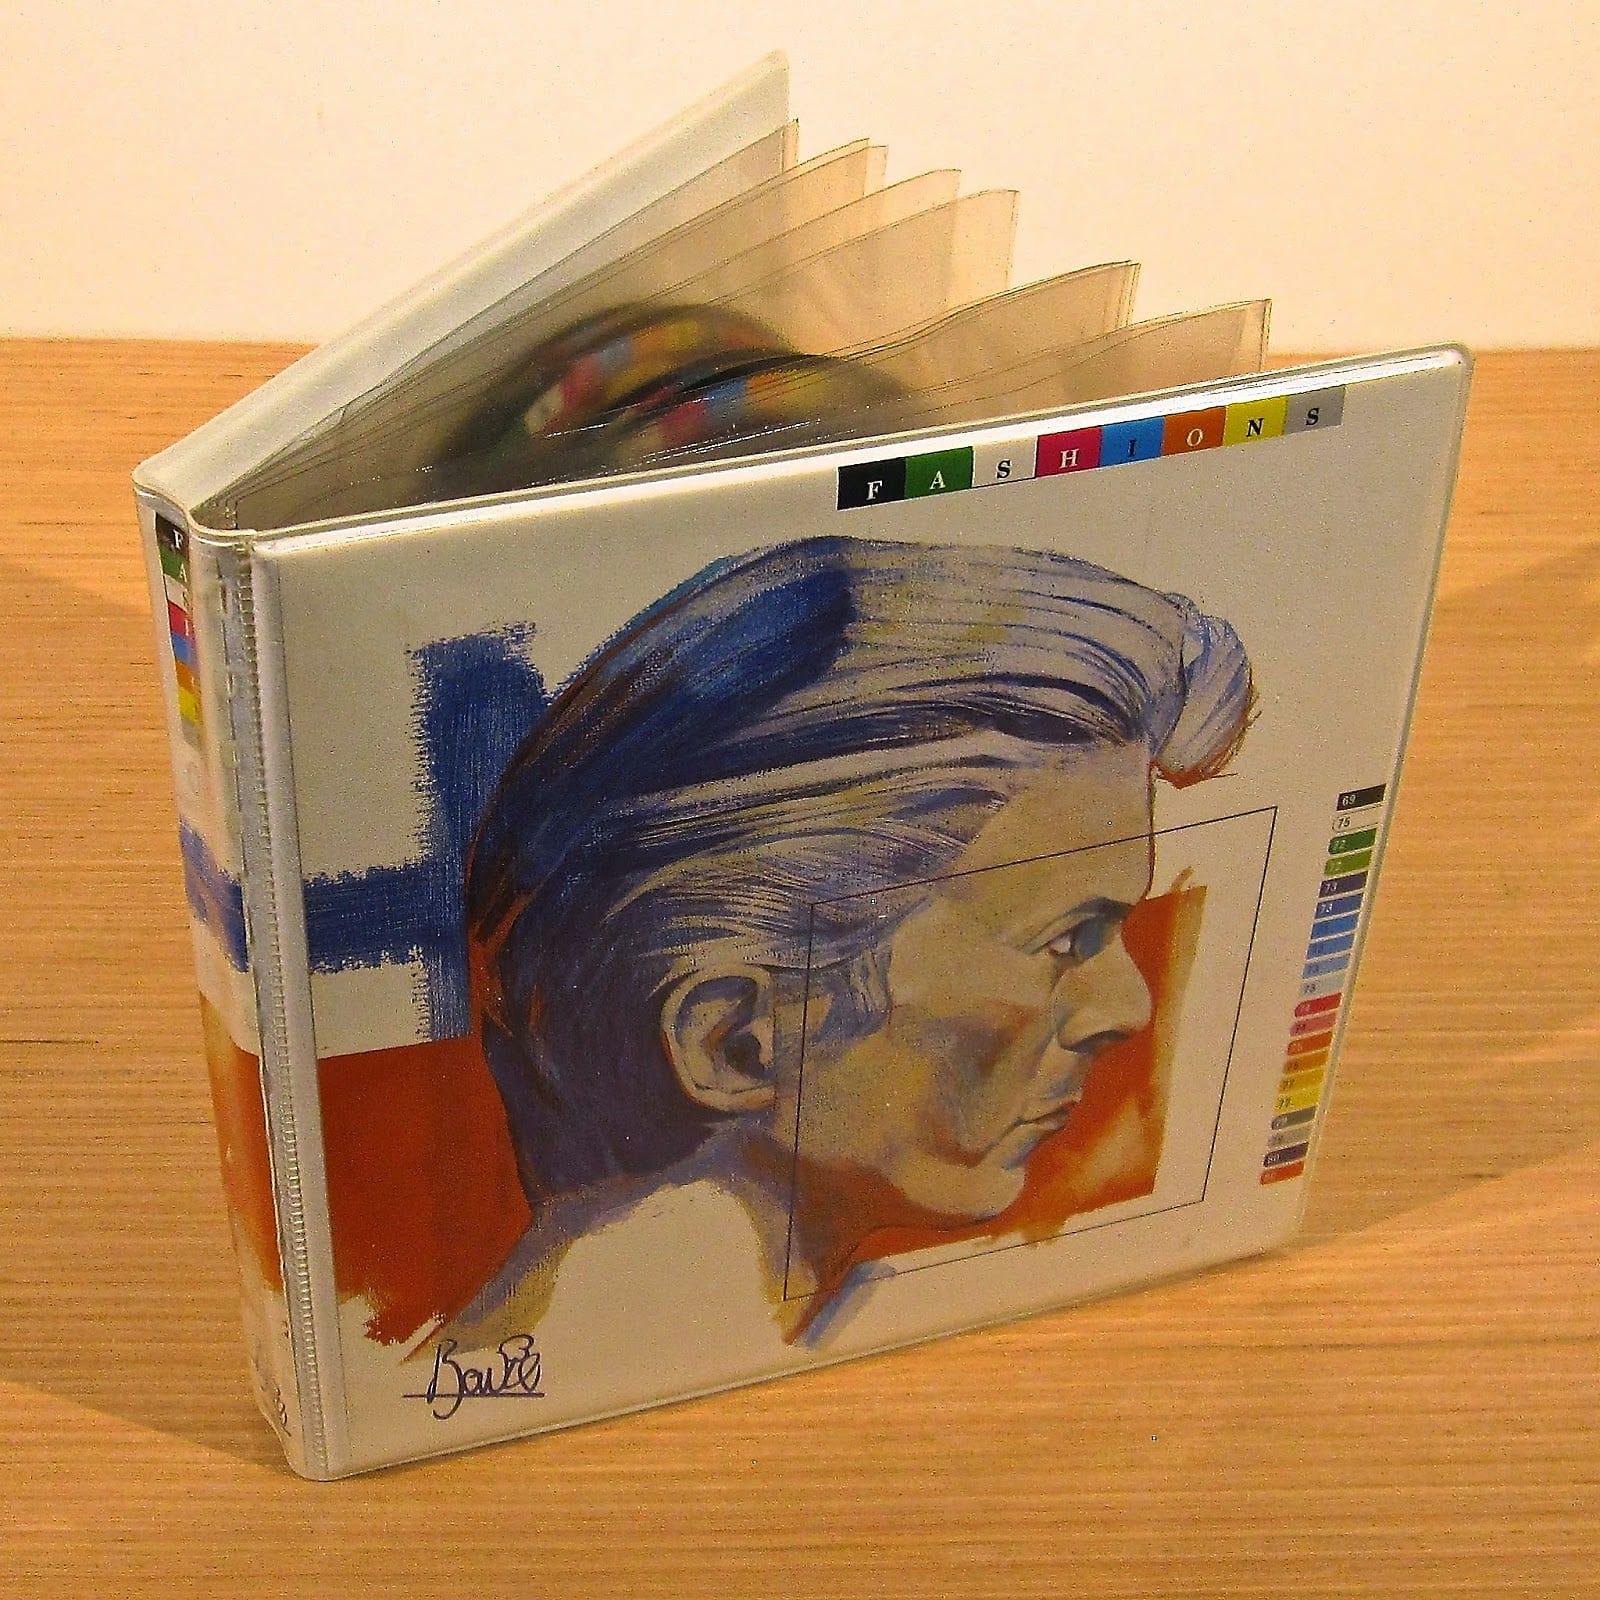 David Bowie - Fashions - Vinyl